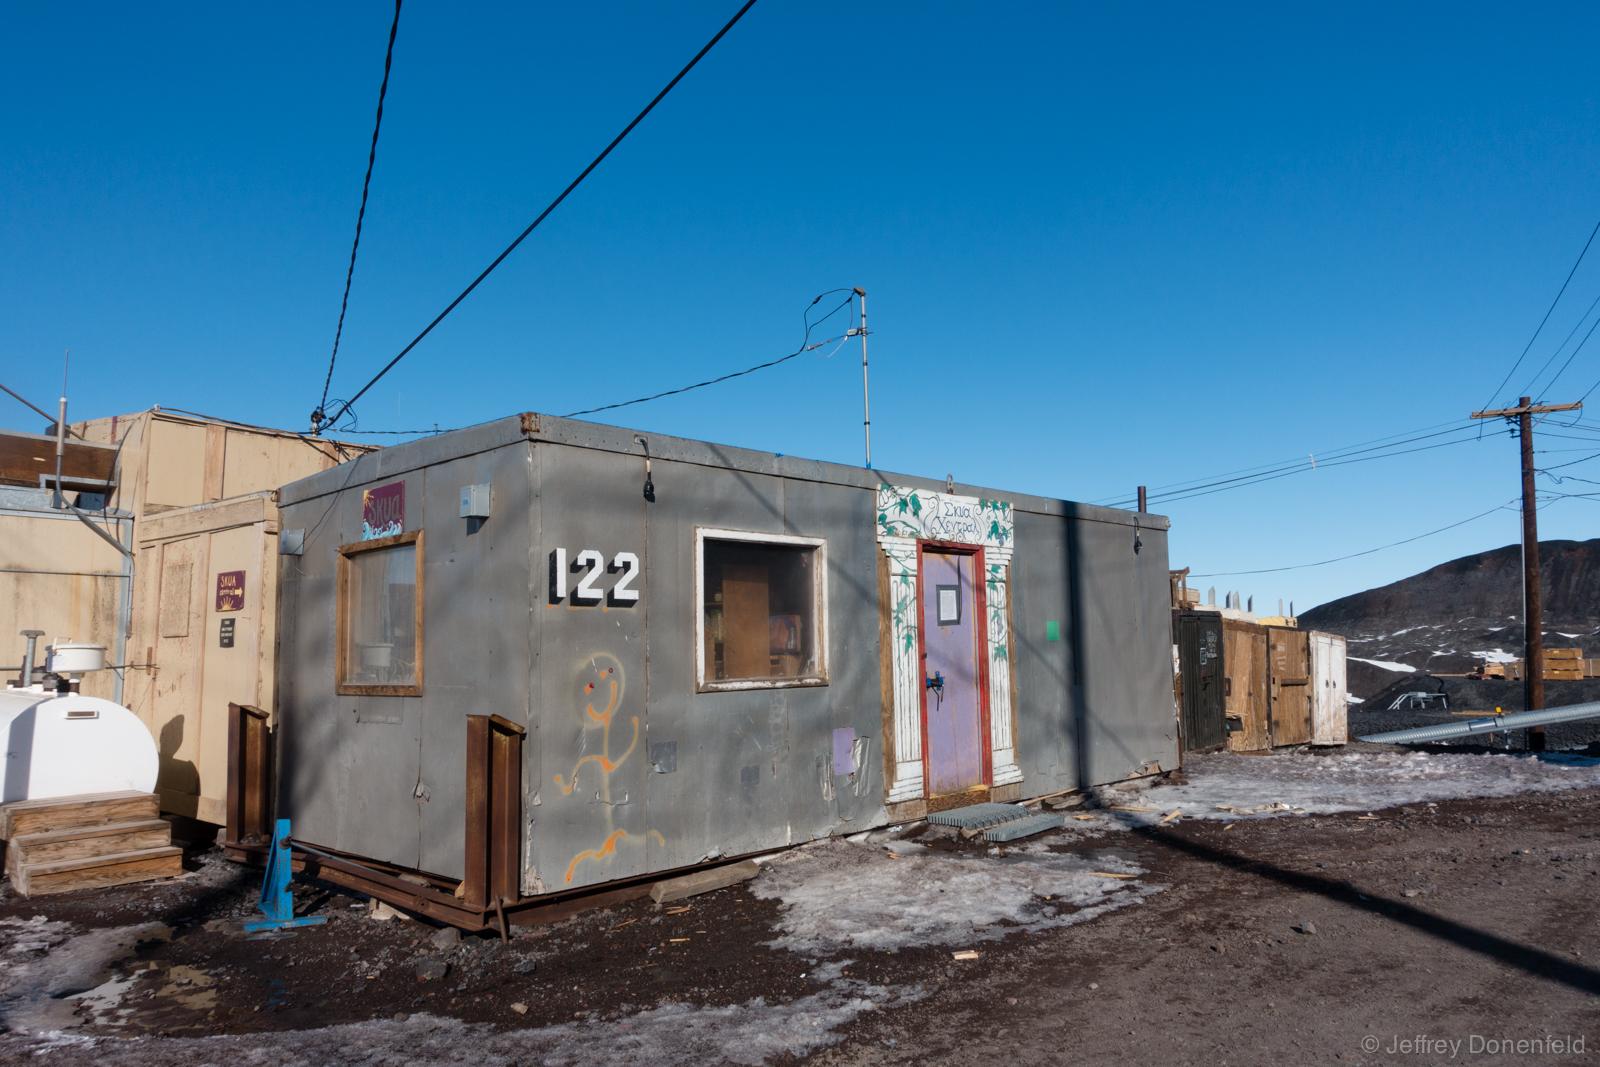 DSC00889-2014-12-11 McMurdo Skua-Donenfeld-1600-WM